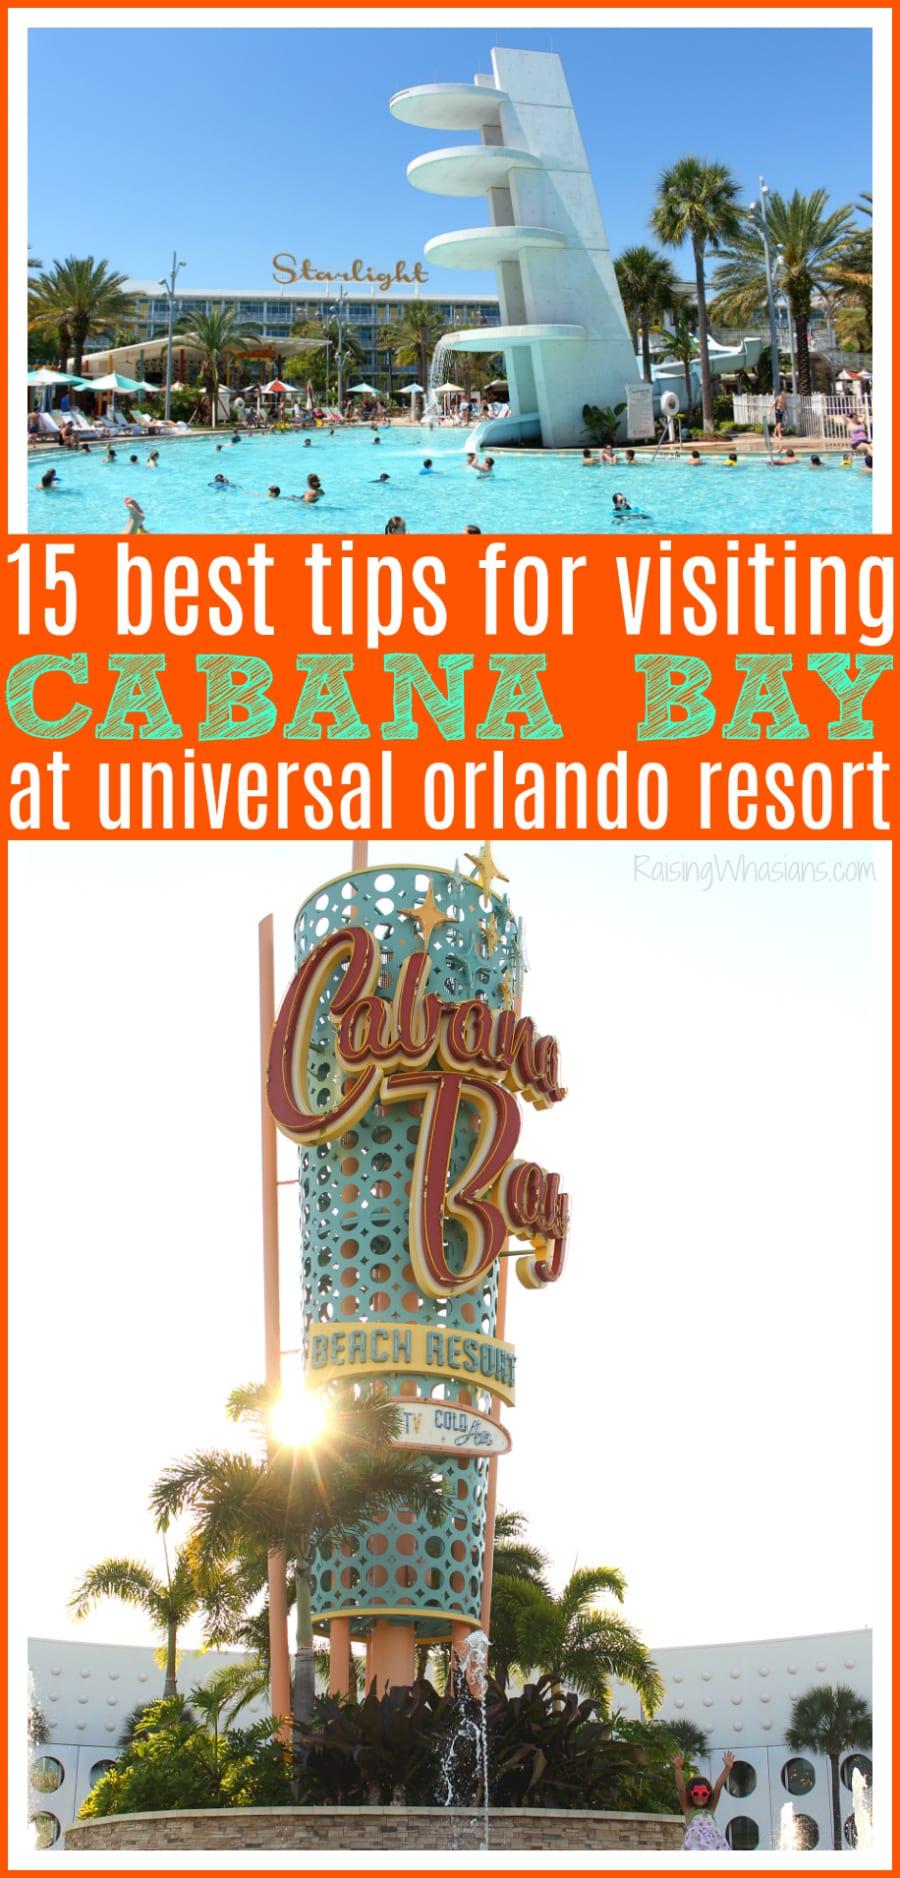 Universal Orlando cabana bay tips